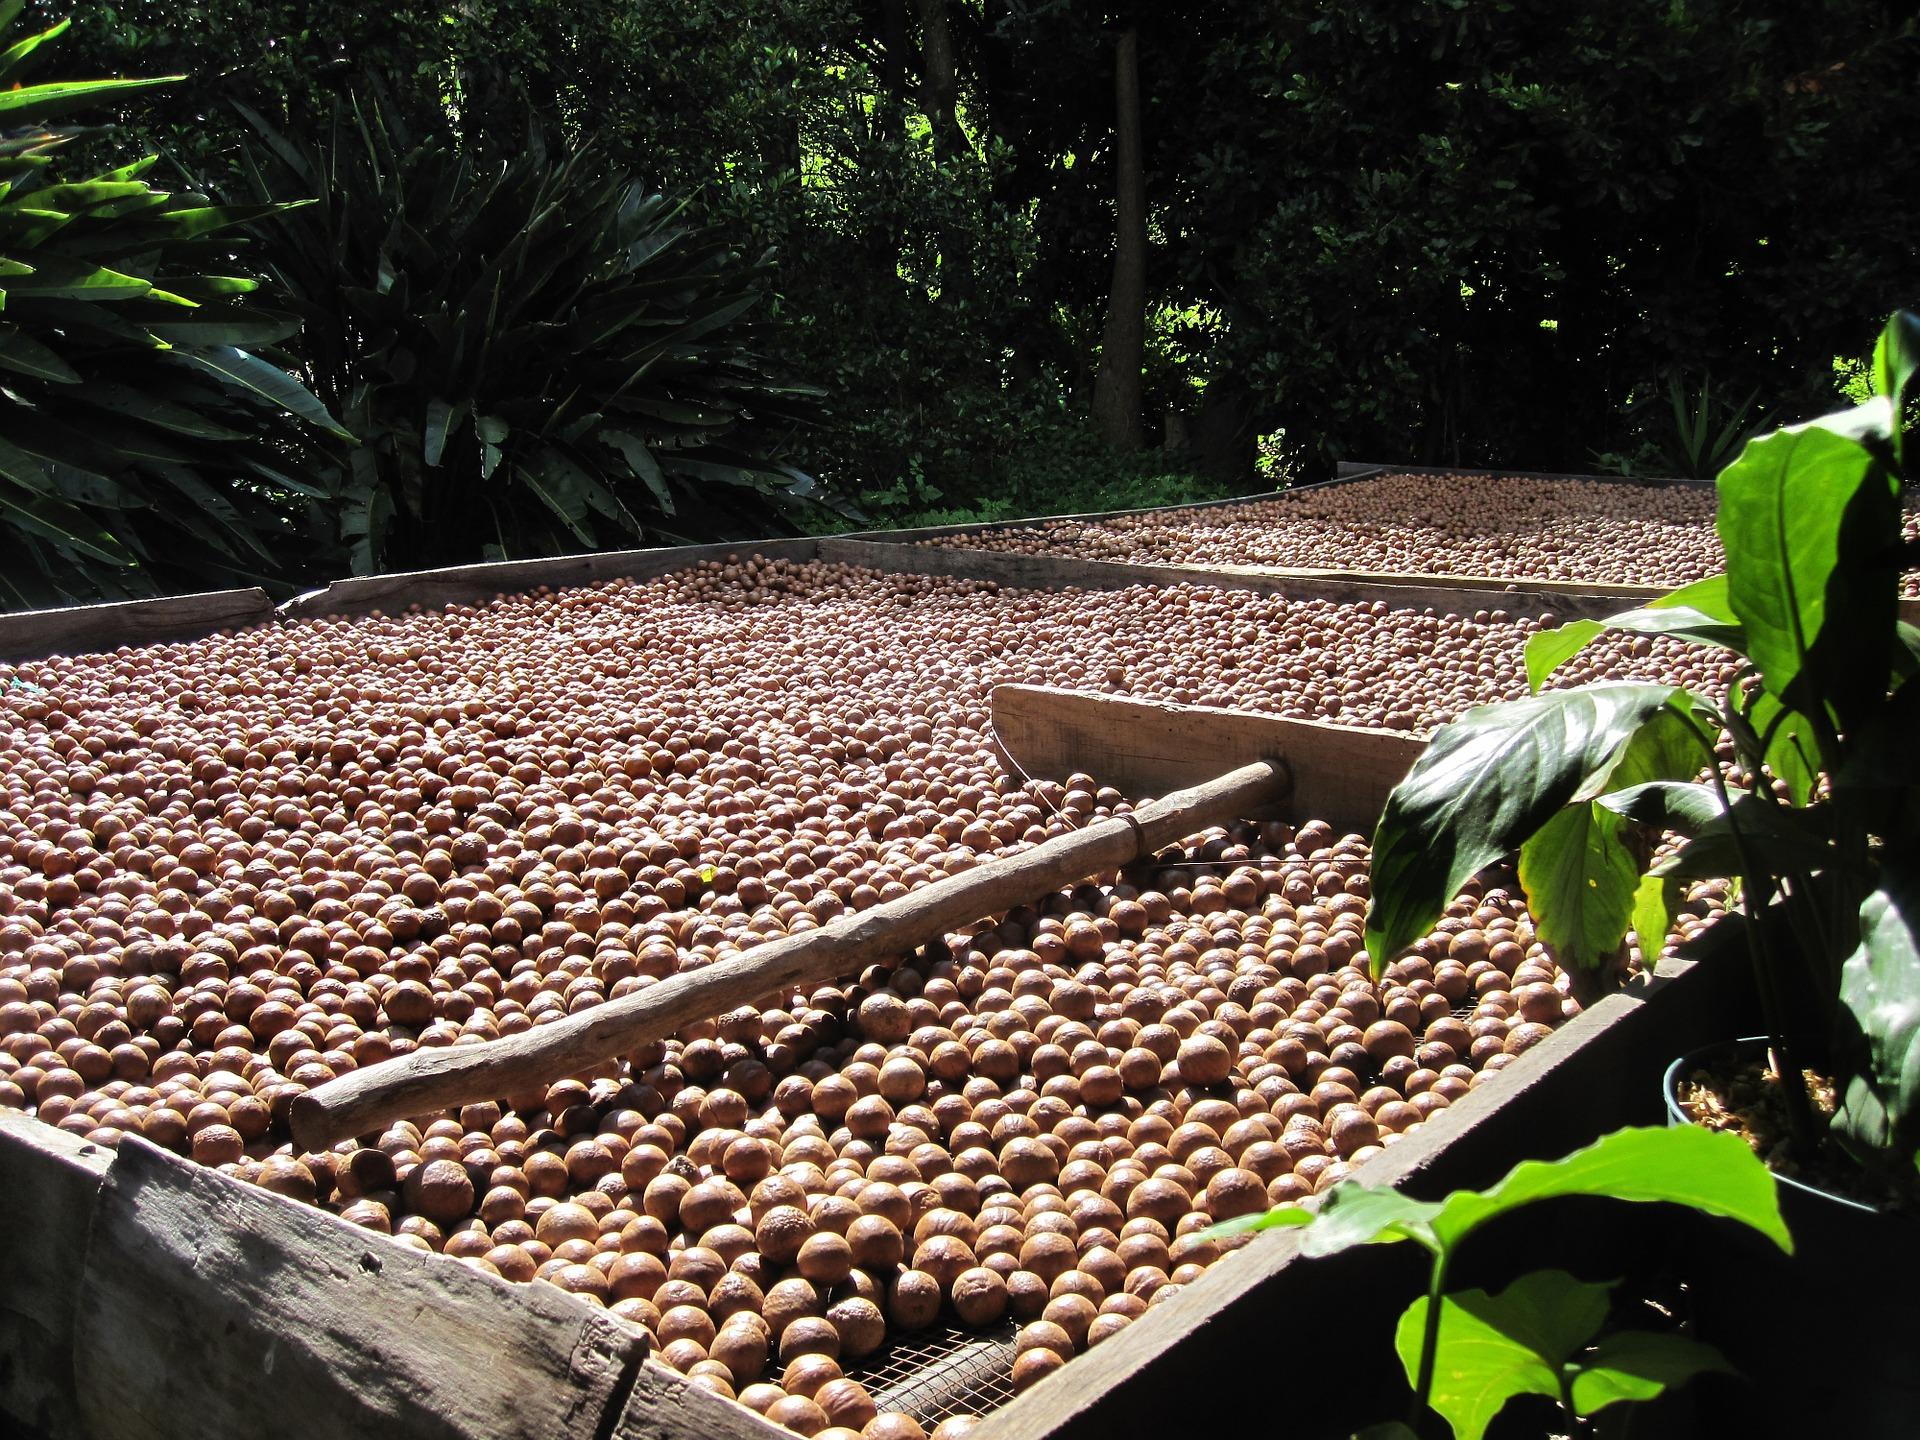 Pixabay – Madacamia, Agriculture